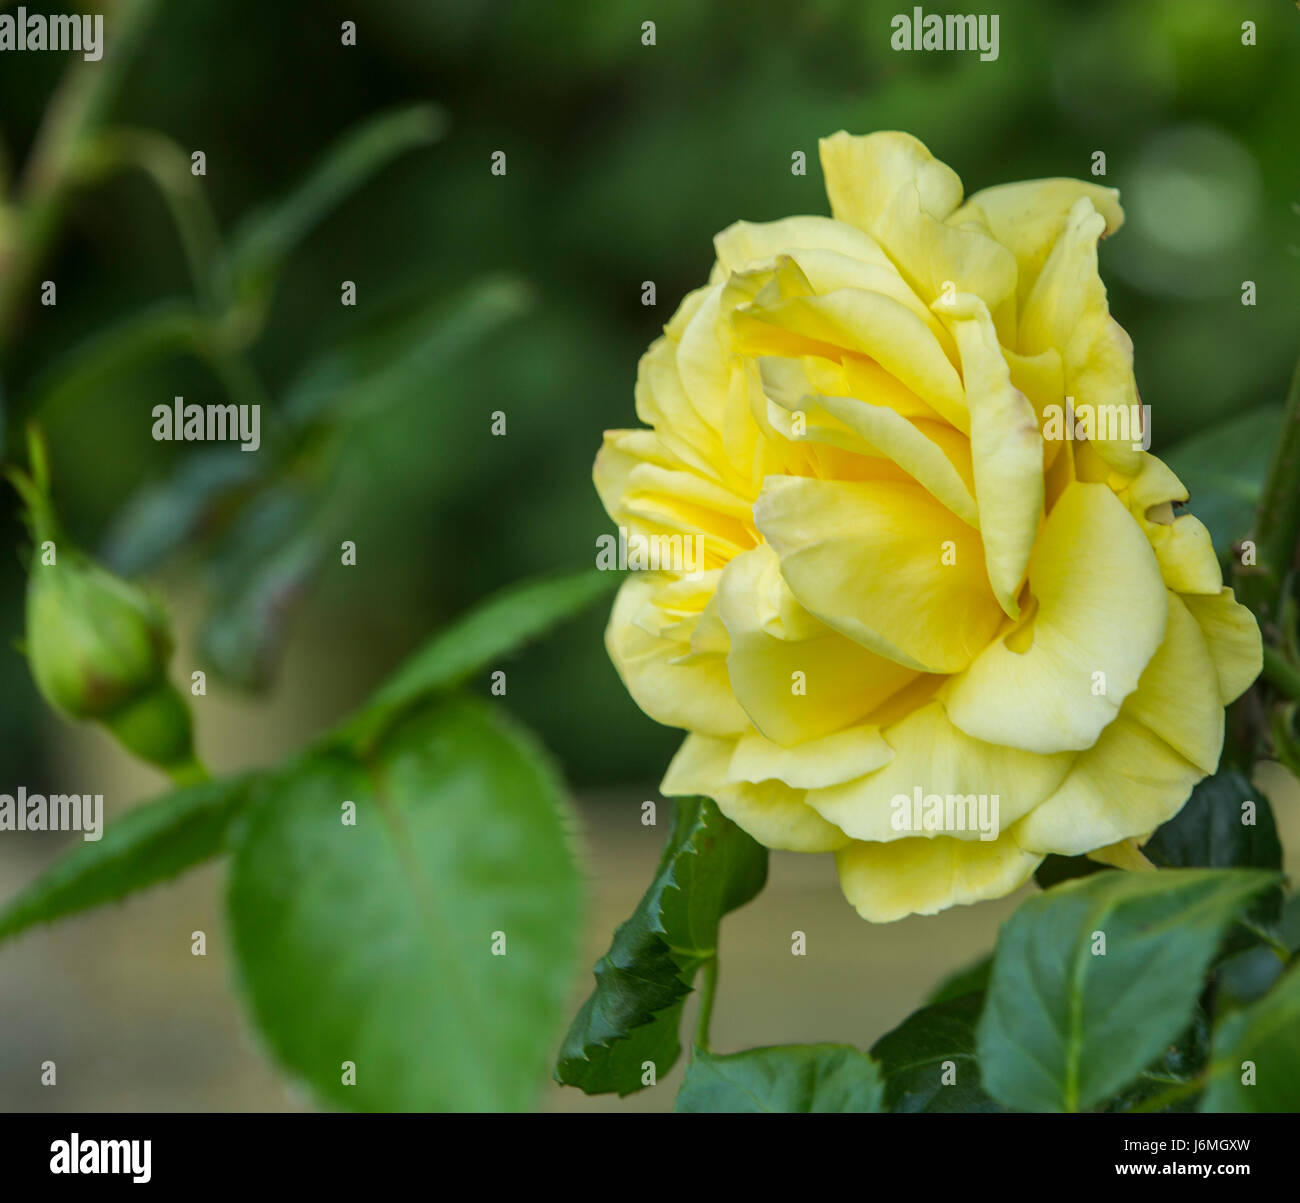 Arthur Bell Climbing Rose,climber, yellow climbing rose, given the Award of Garden Merit given by the Royal Horticultural Stock Photo